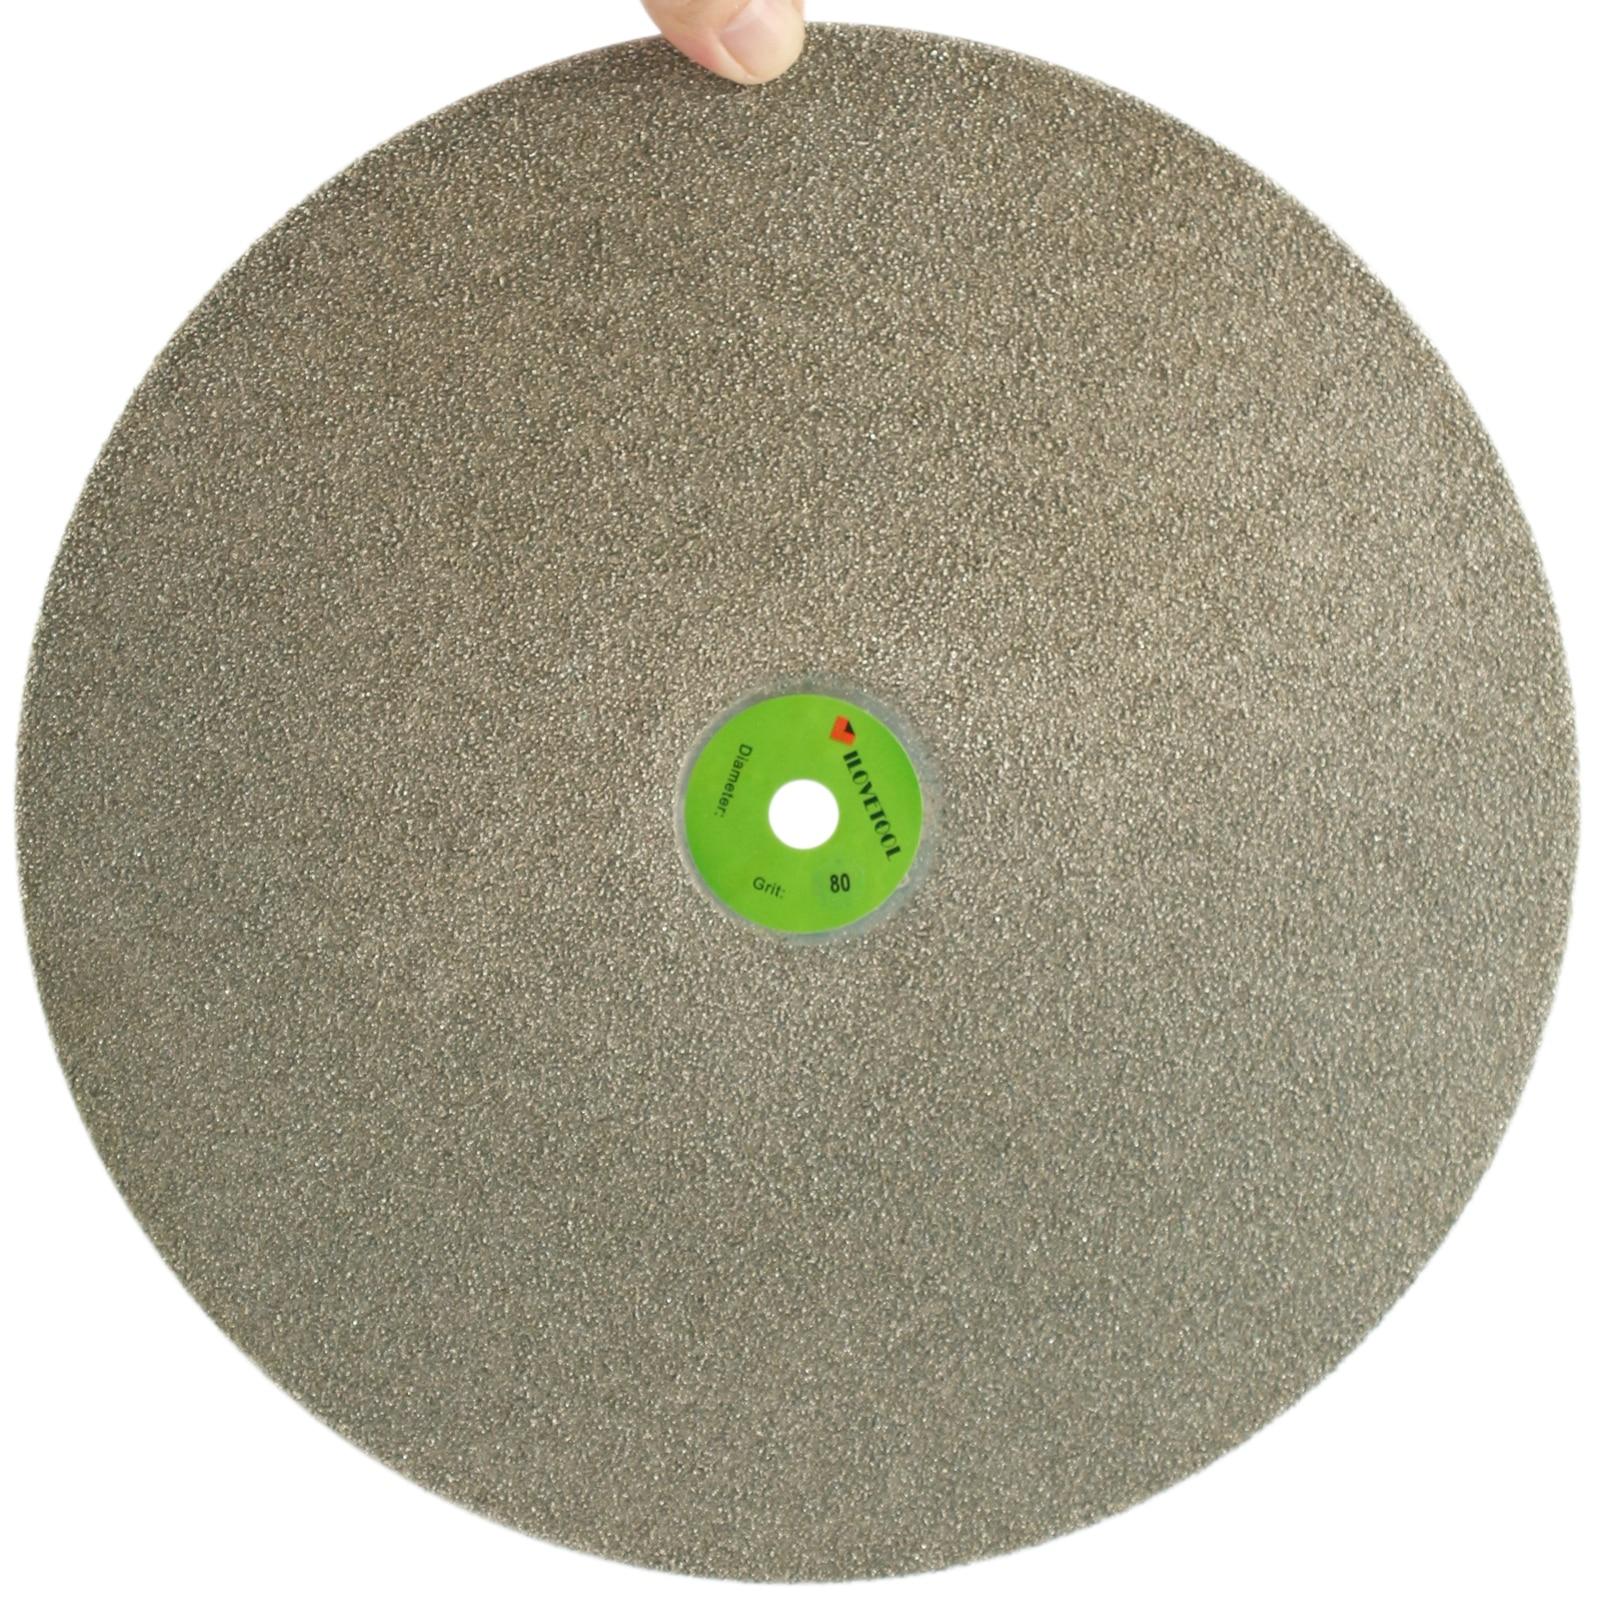 14 inch Diamond Coated Flat Lap Disk Grinding Polishing Wheel Grit 80 - 1000 ILOVETOOL 6 inch lapidary concave arc diamond coated grinding wheel grind spherical 6 mm ilovetool